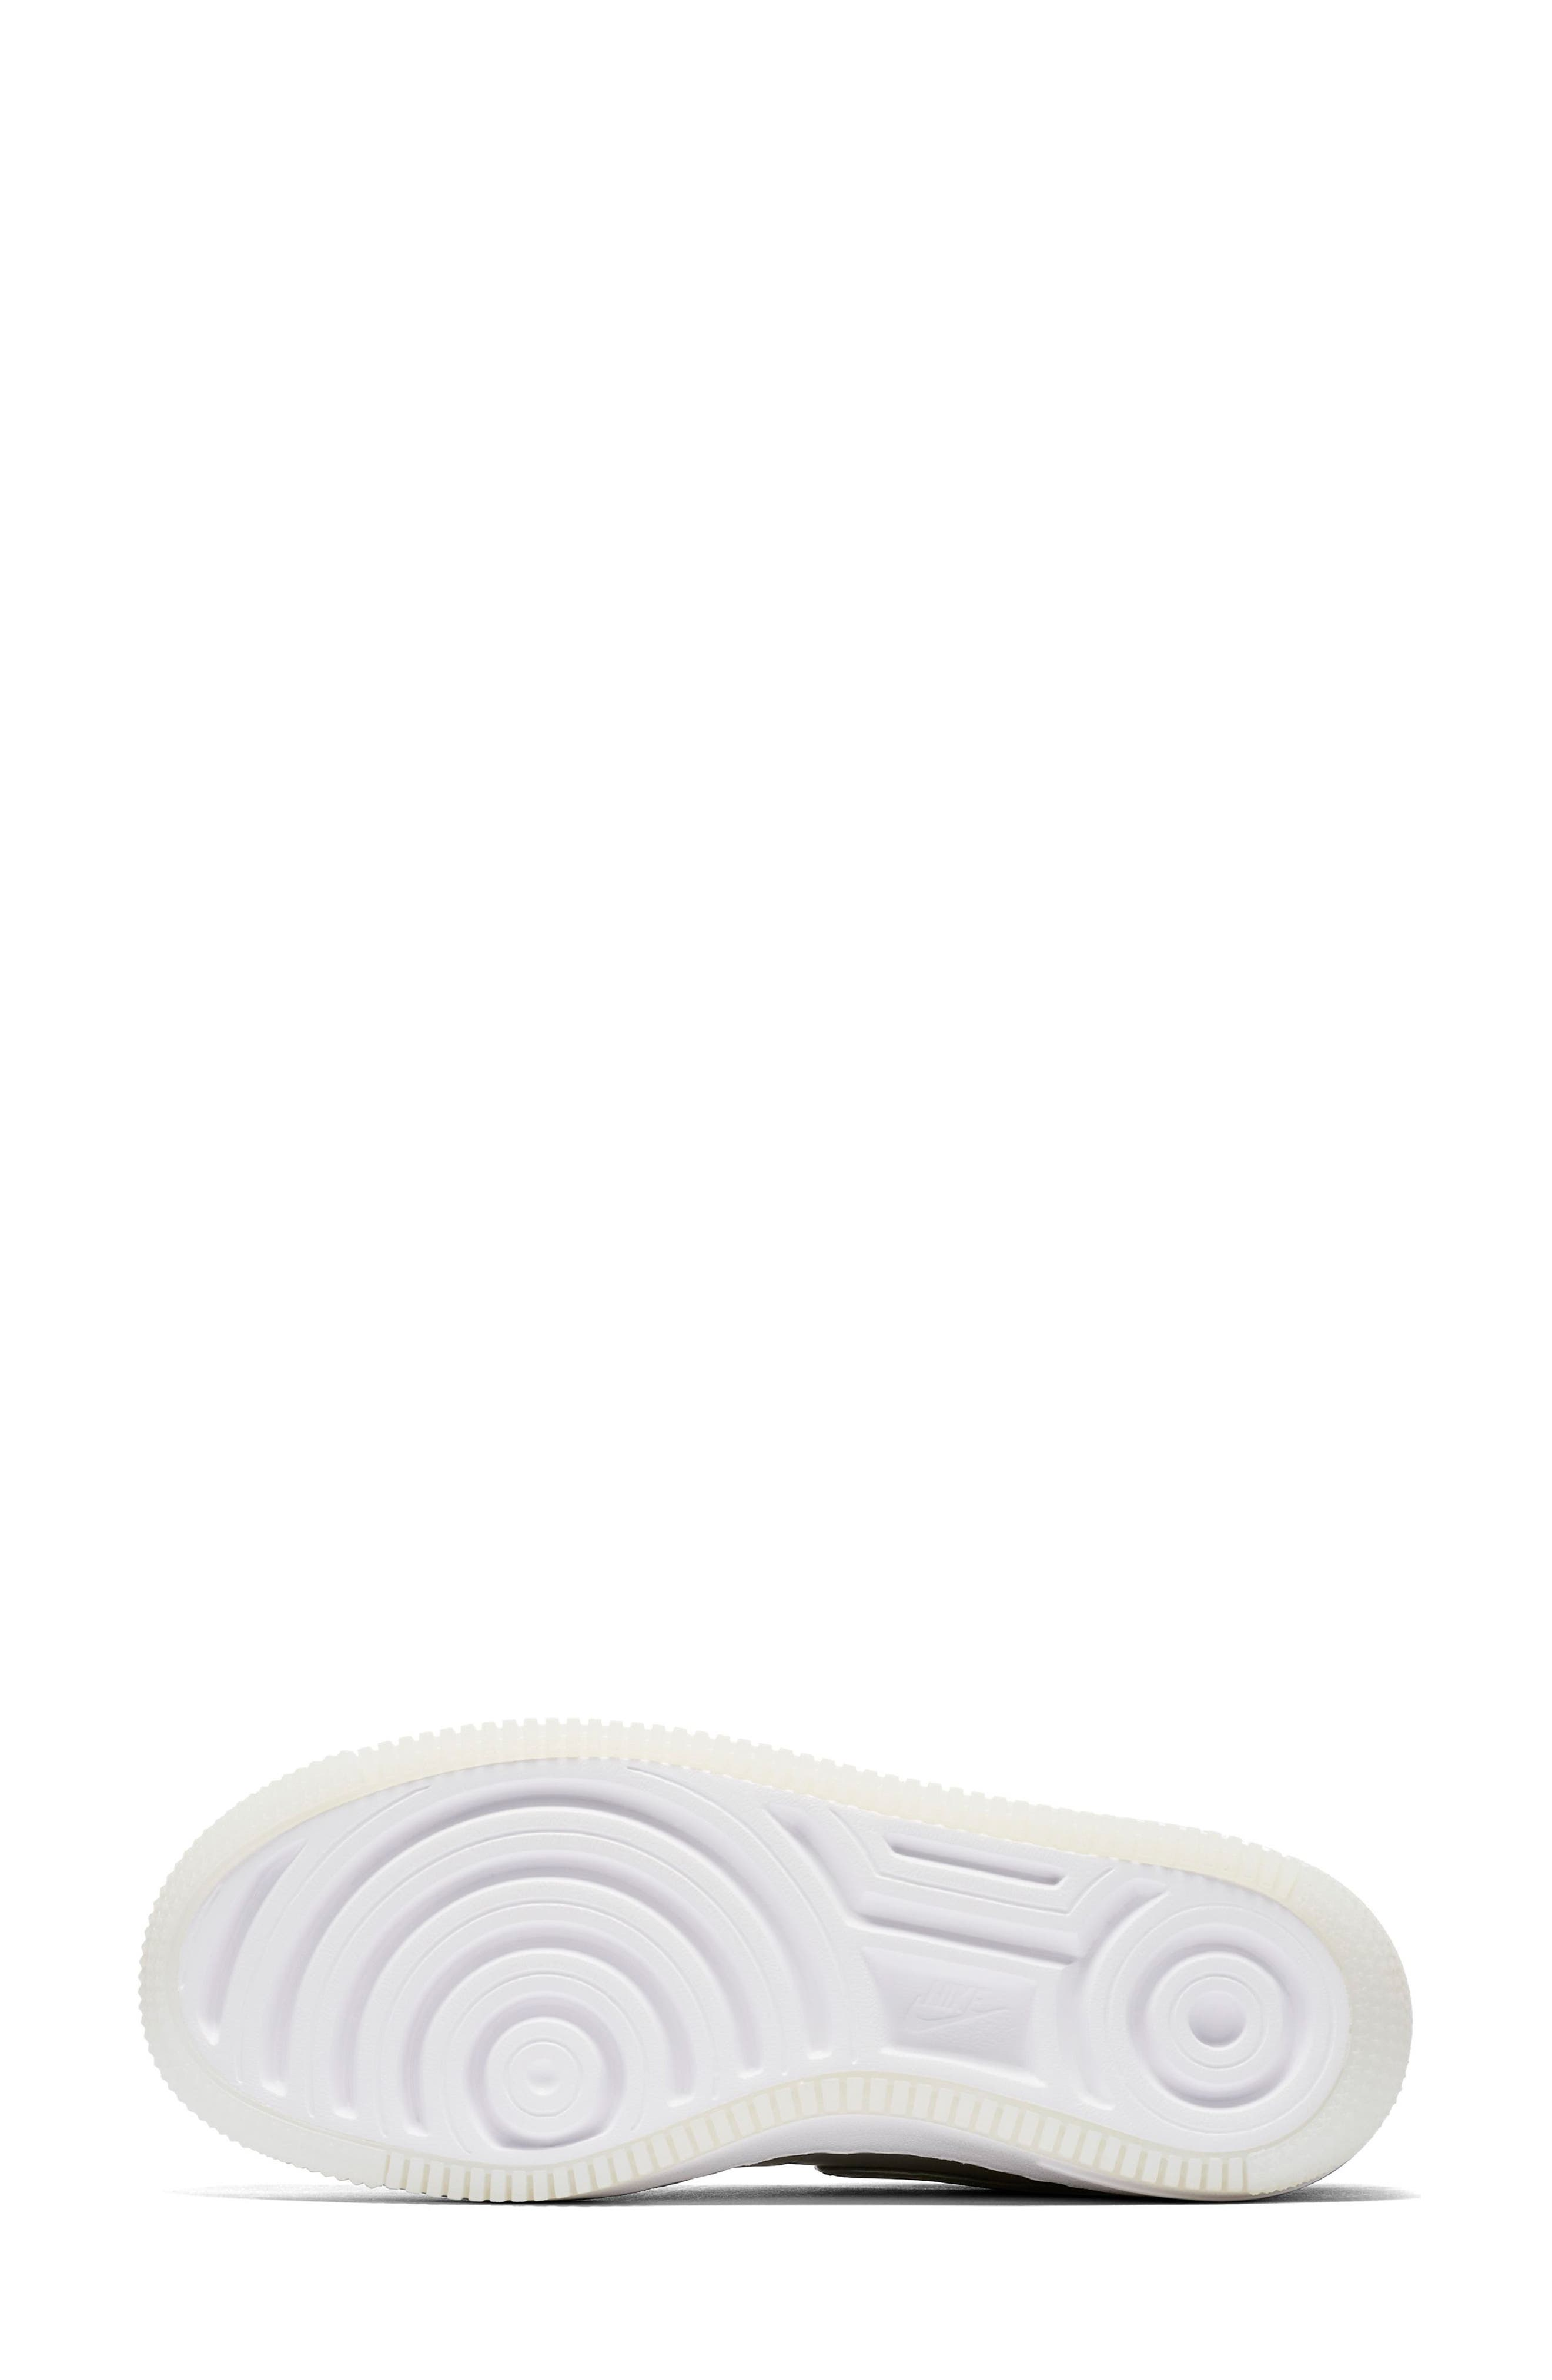 Air Force 1 Upstep Premium LX Shoe,                             Alternate thumbnail 6, color,                             252